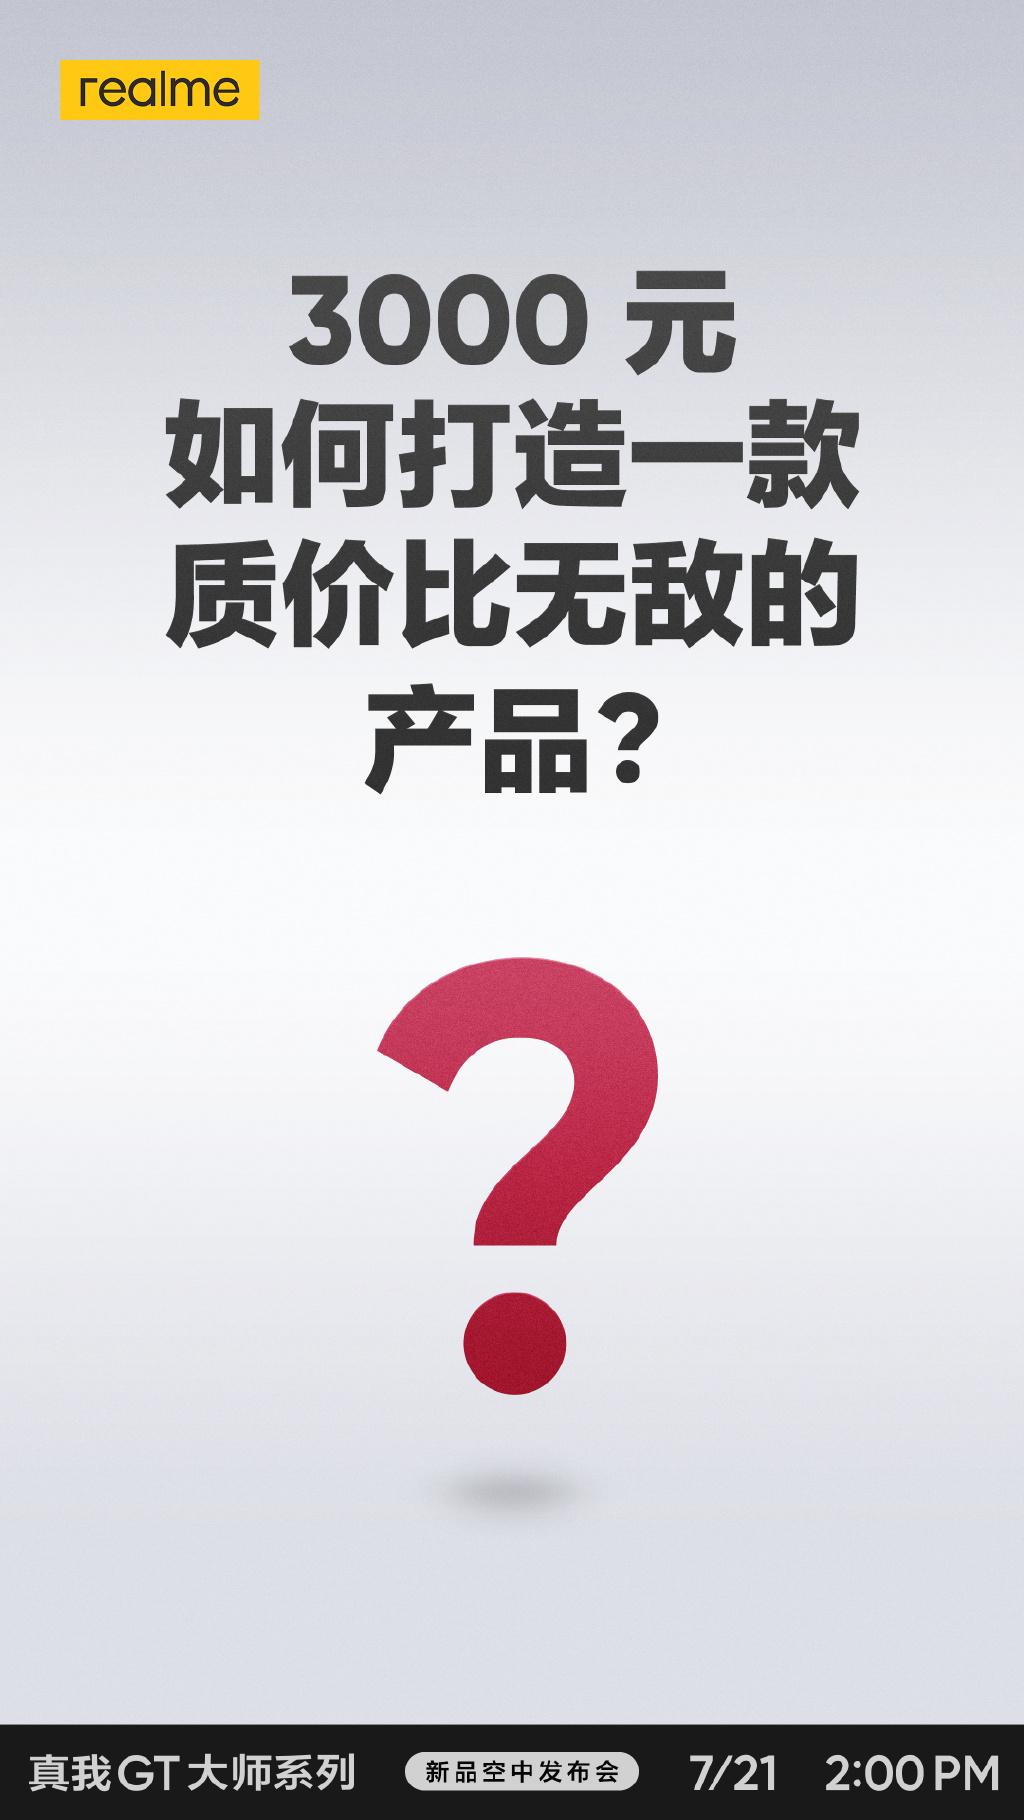 realme GT大师版售价曝光:号称质价比无敌